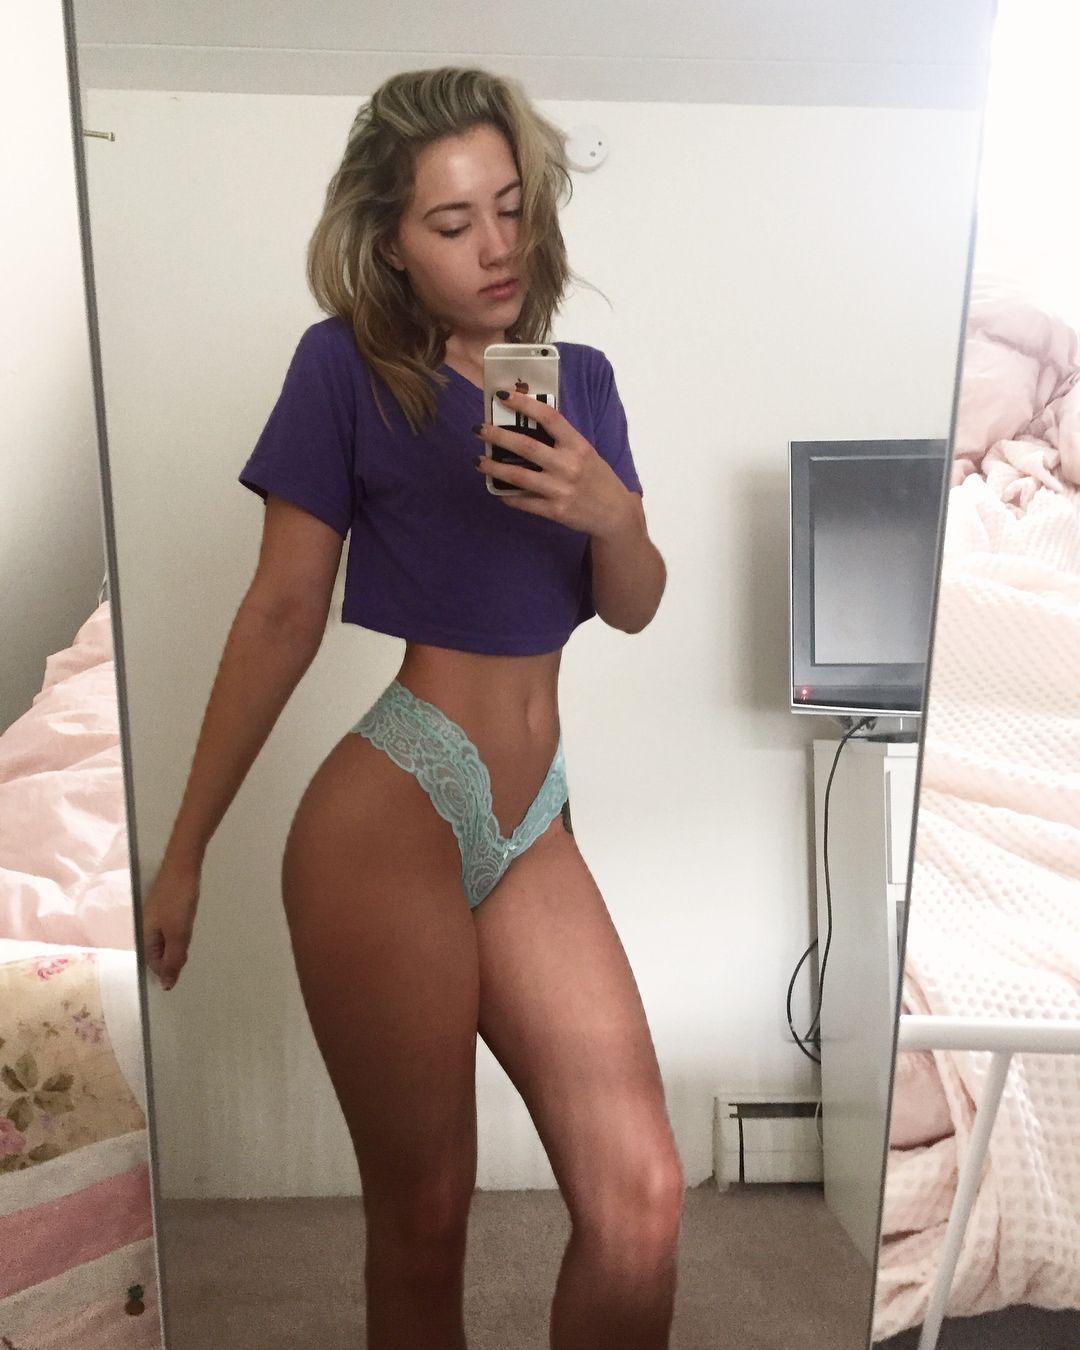 ethiopian girl porno online